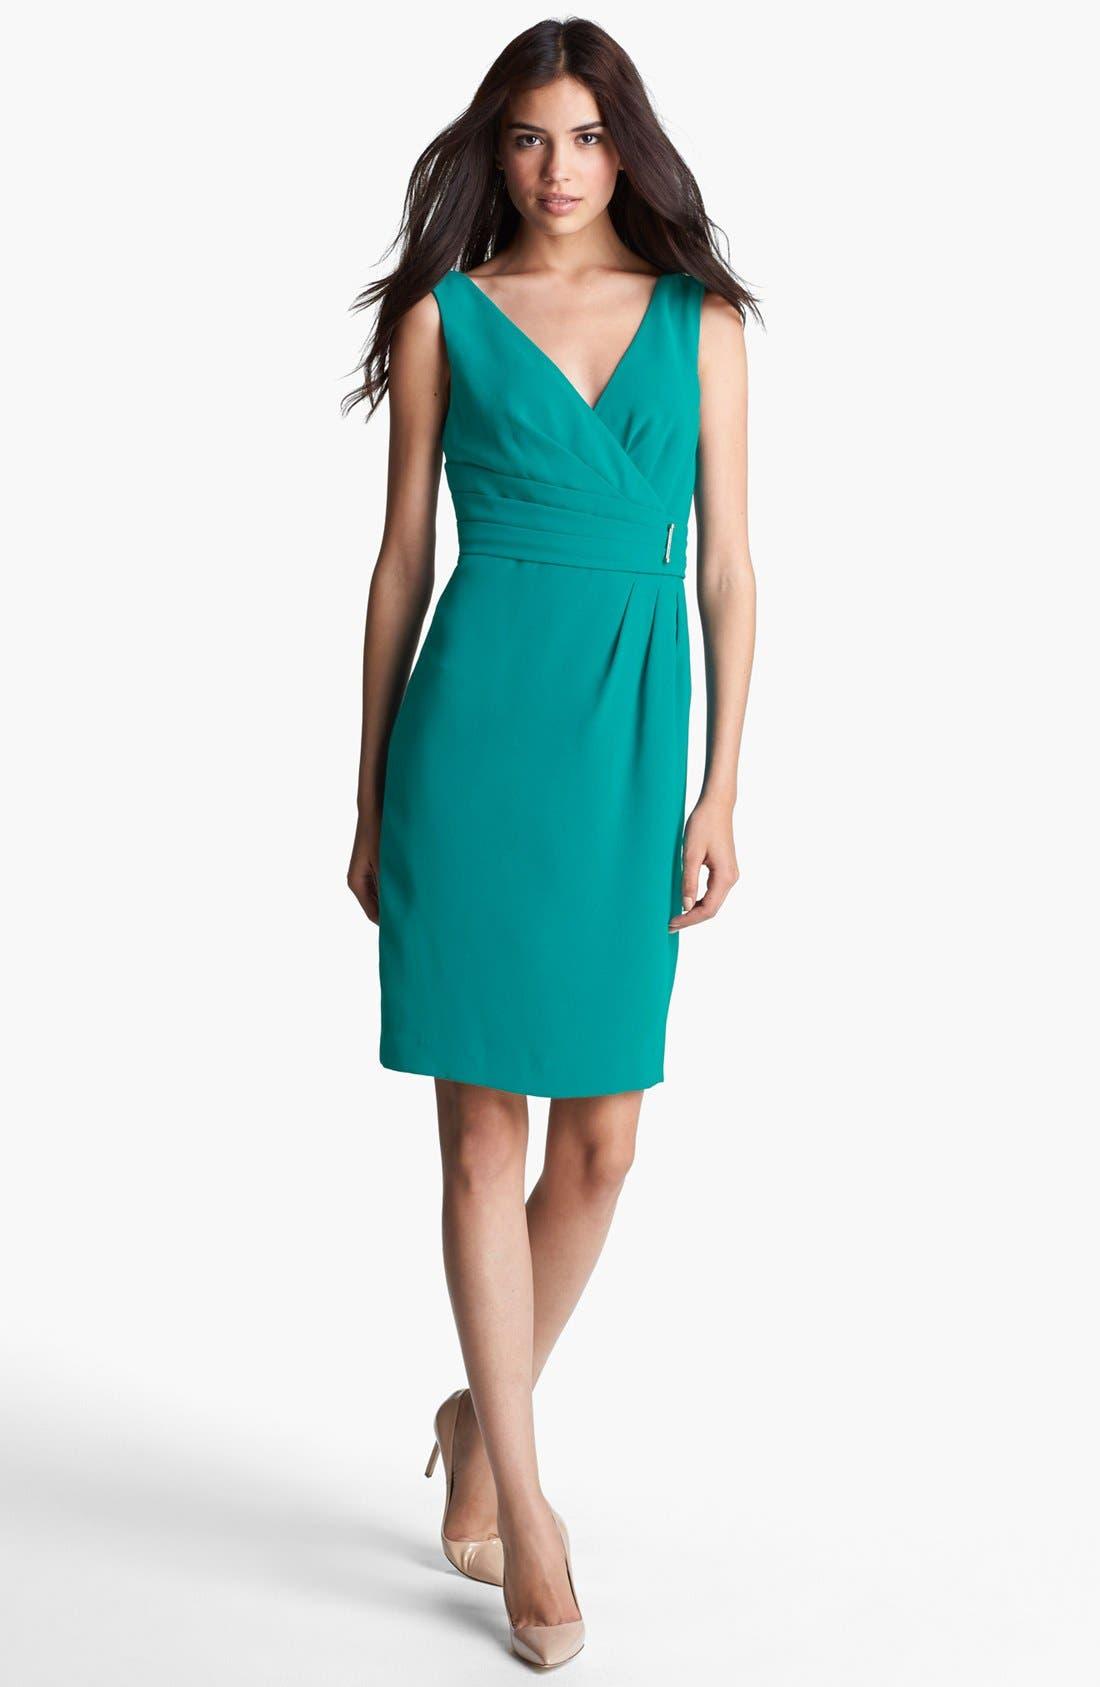 Alternate Image 1 Selected - Ivanka Trump Side Embellished Sheath Dress